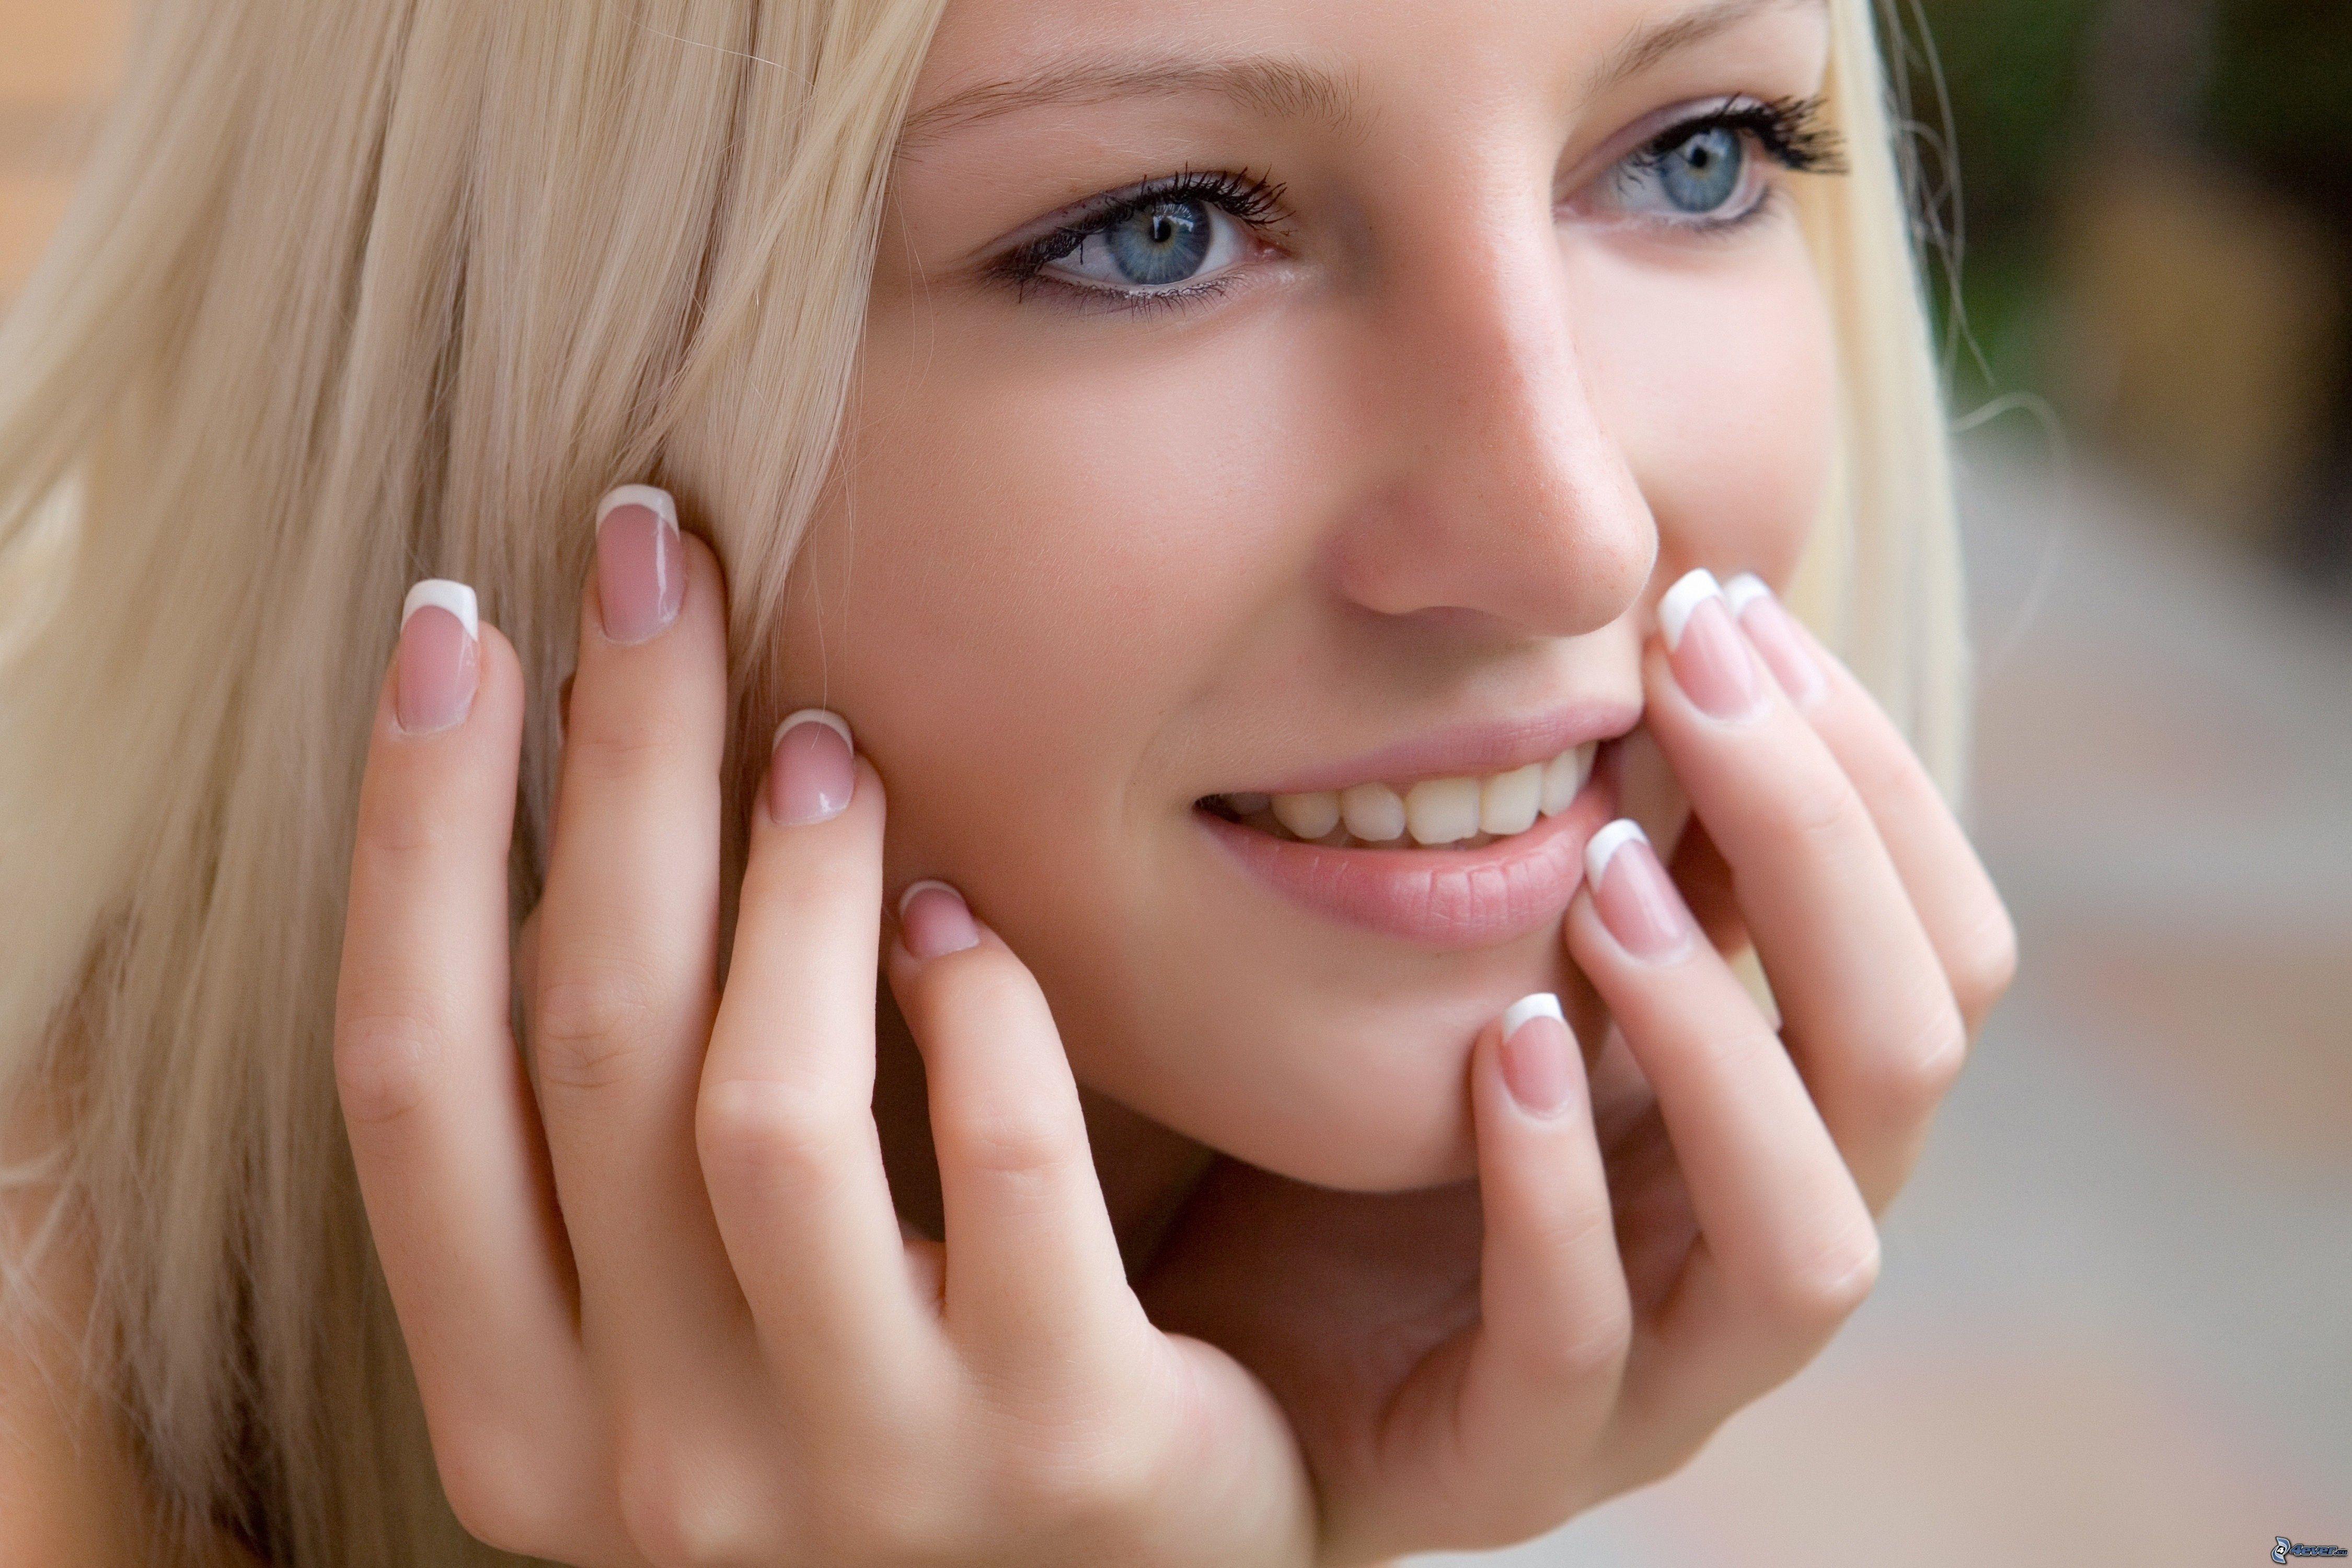 belle-femme-visage,-blonde,-yeux-bleus-178219